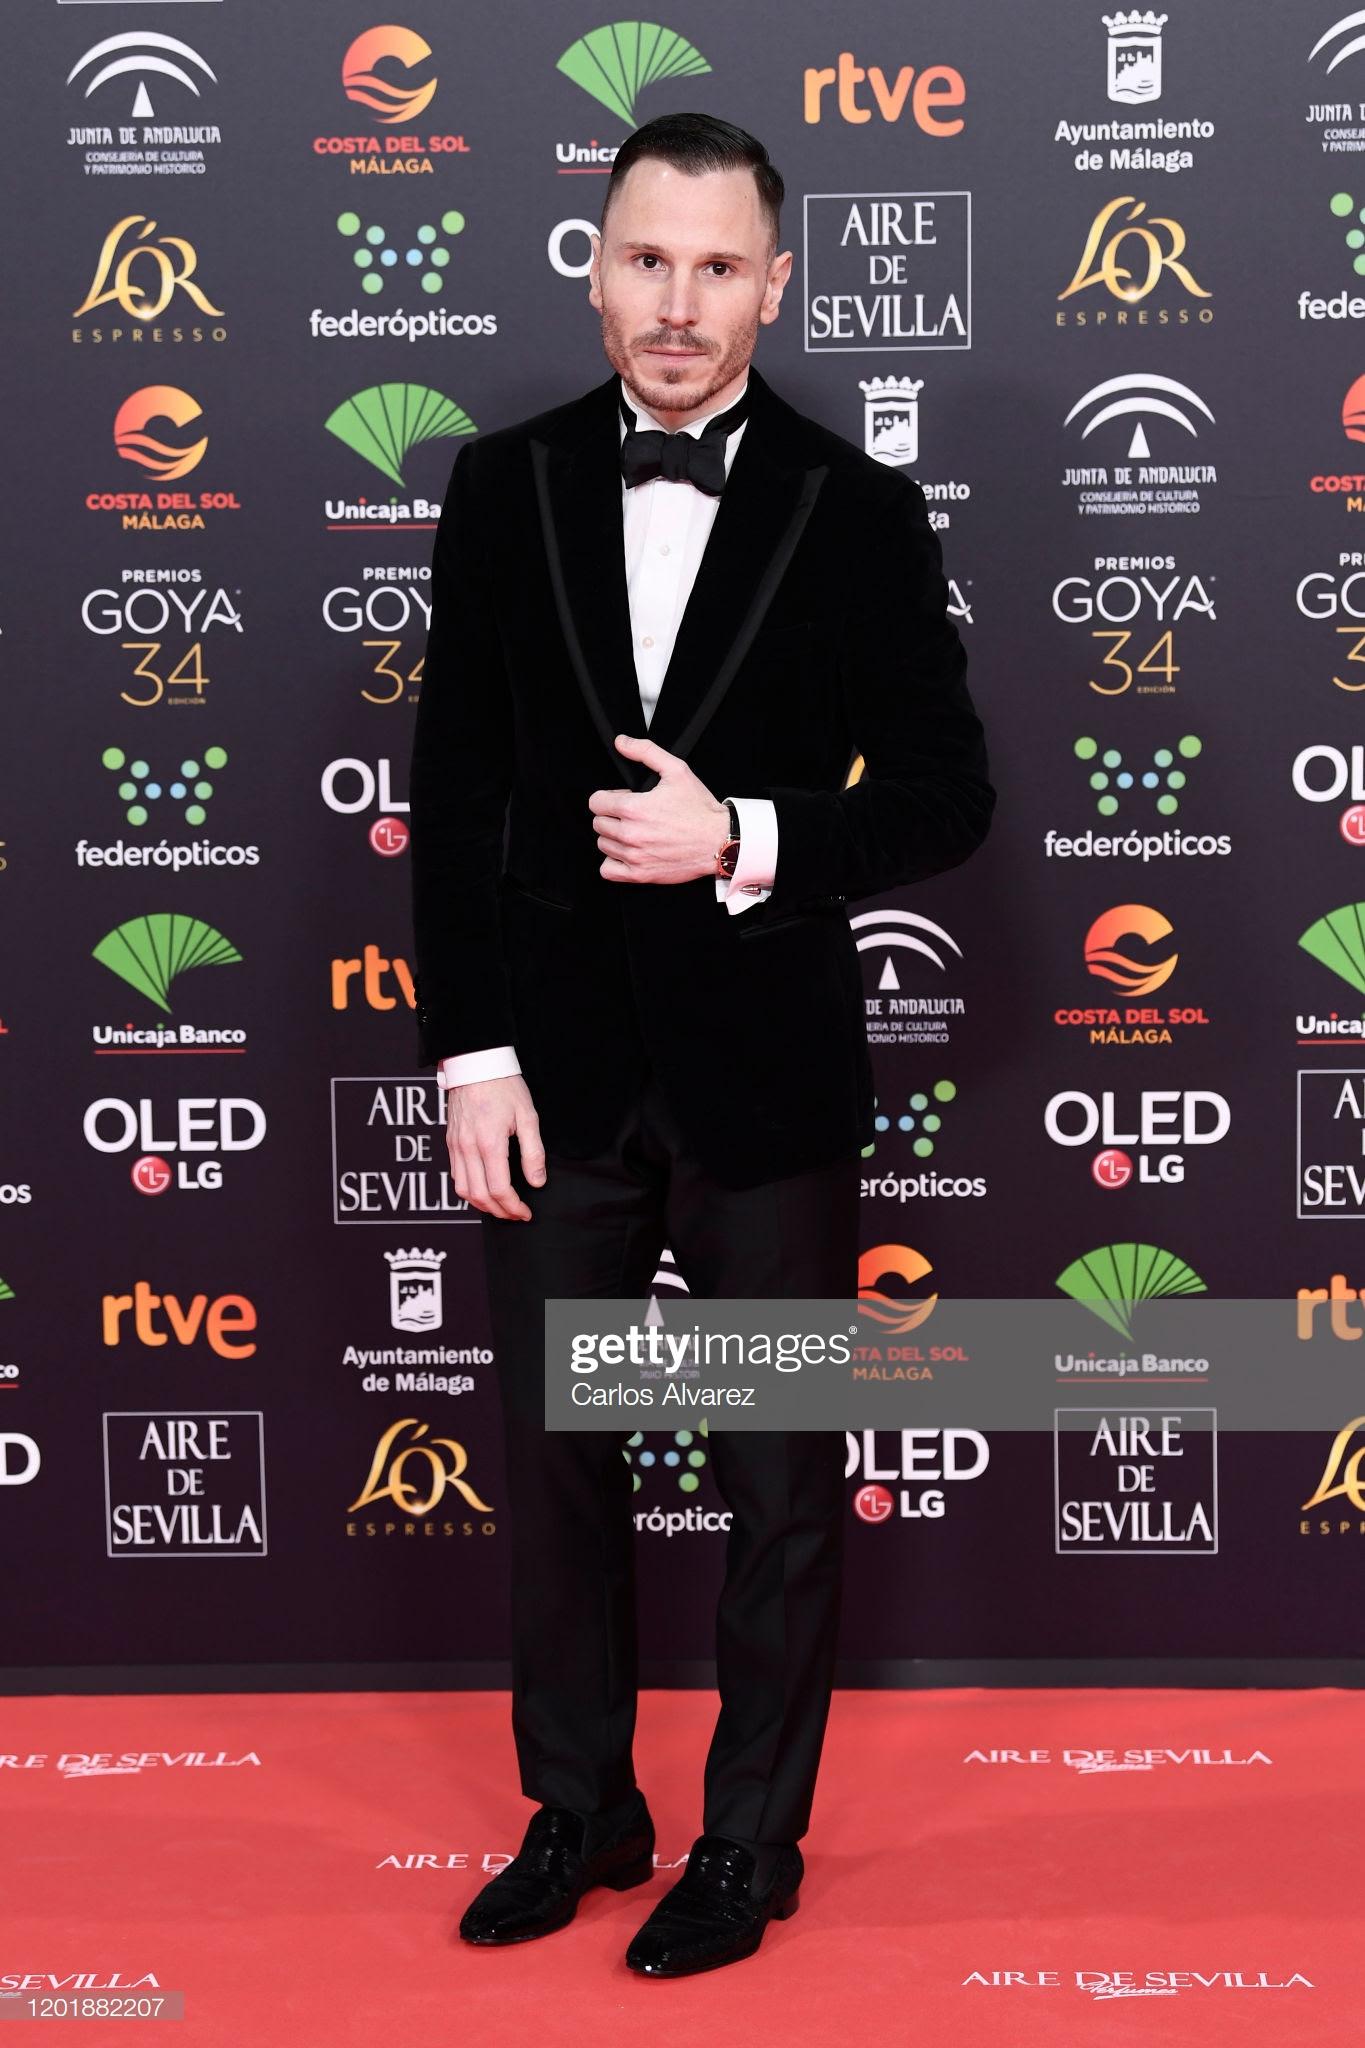 4e944535 a488 4252 b144 b7667a8d6578 - Premios Goya 2020 : Looks de todas las celebrities que lucieron  marcas de Replica